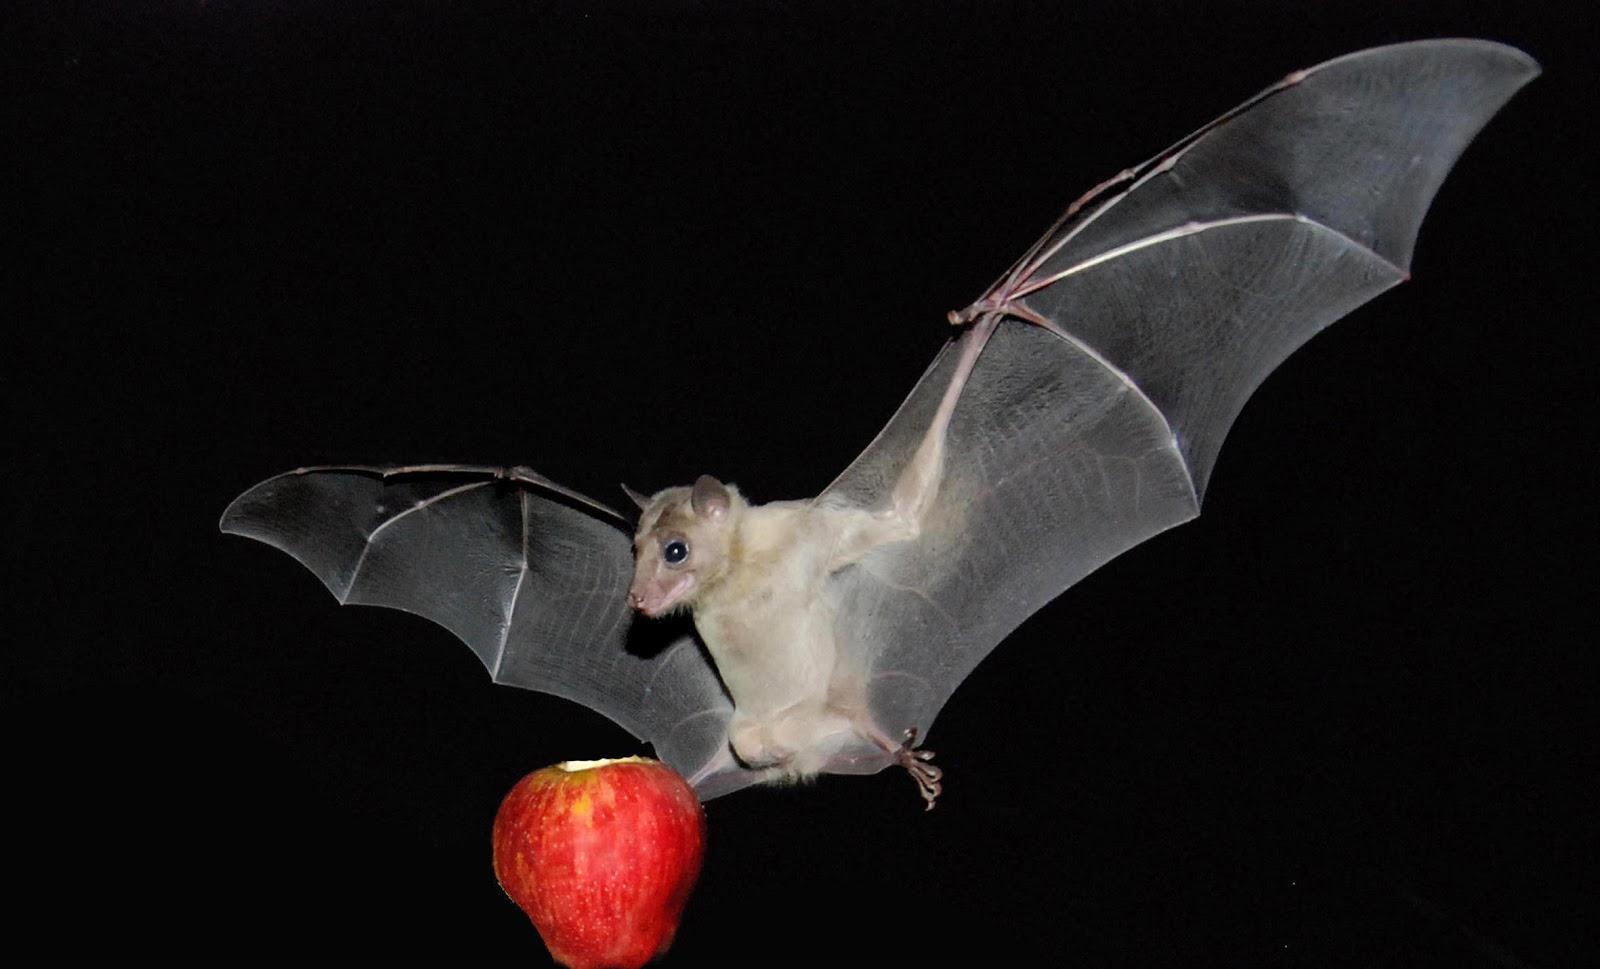 World All Animals: Bats new photos